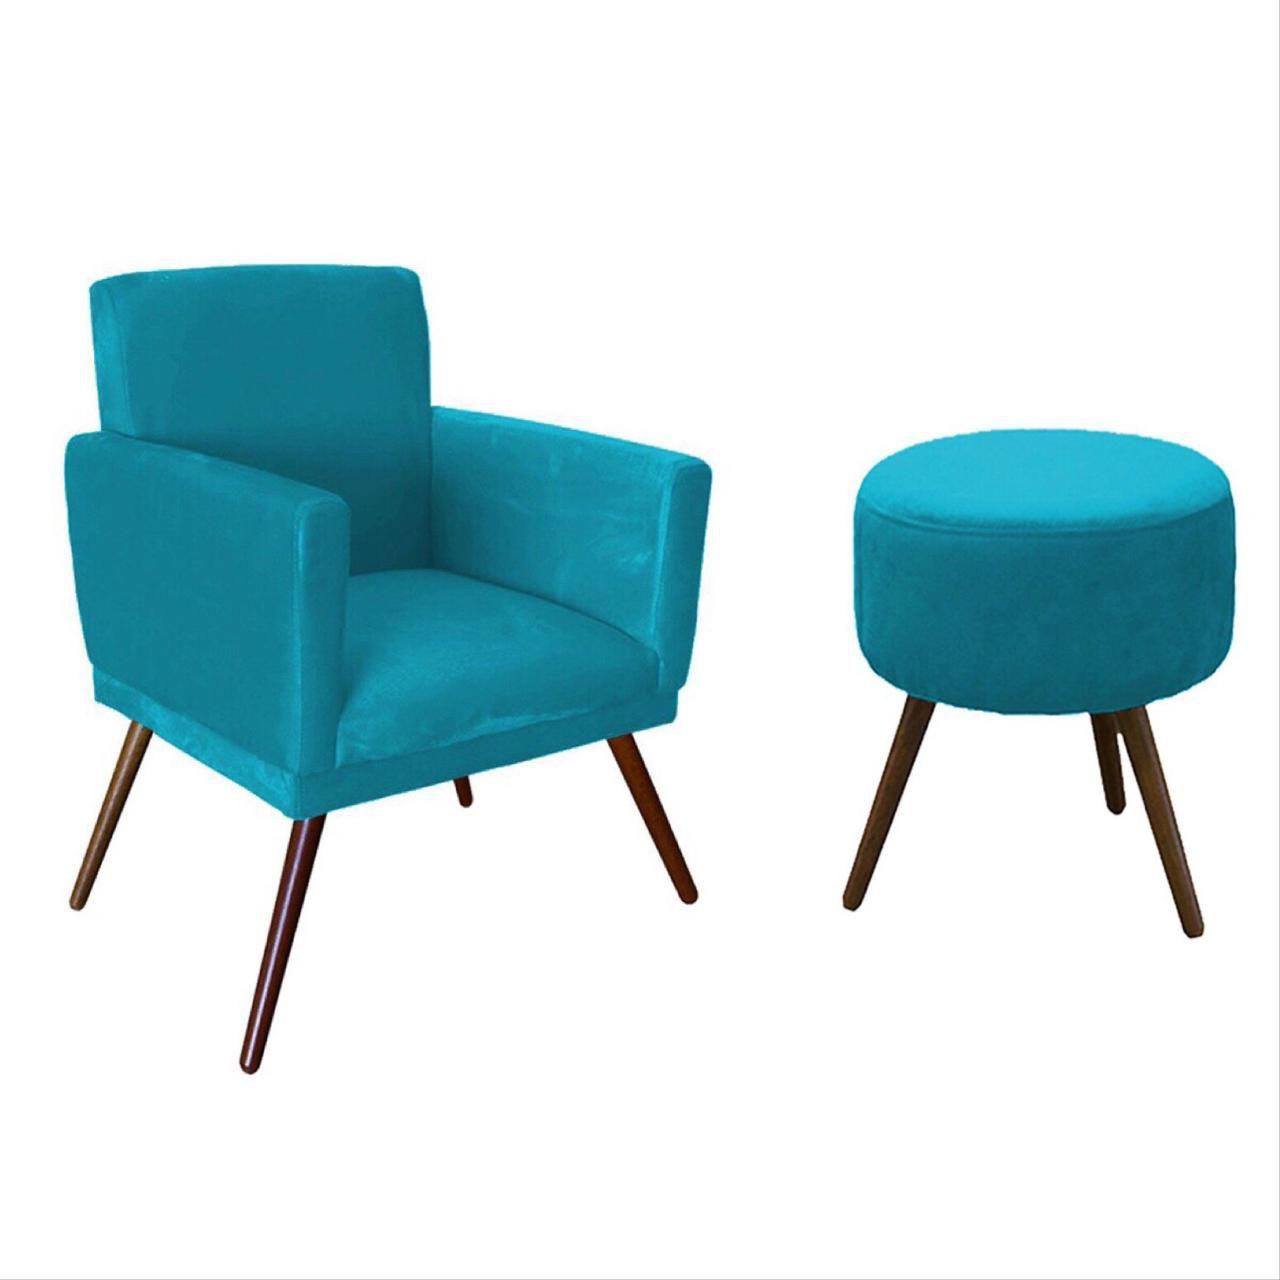 Kit Poltrona Decorativa Nina com rodapé e Puff redondo Azul - Bela casa Shop